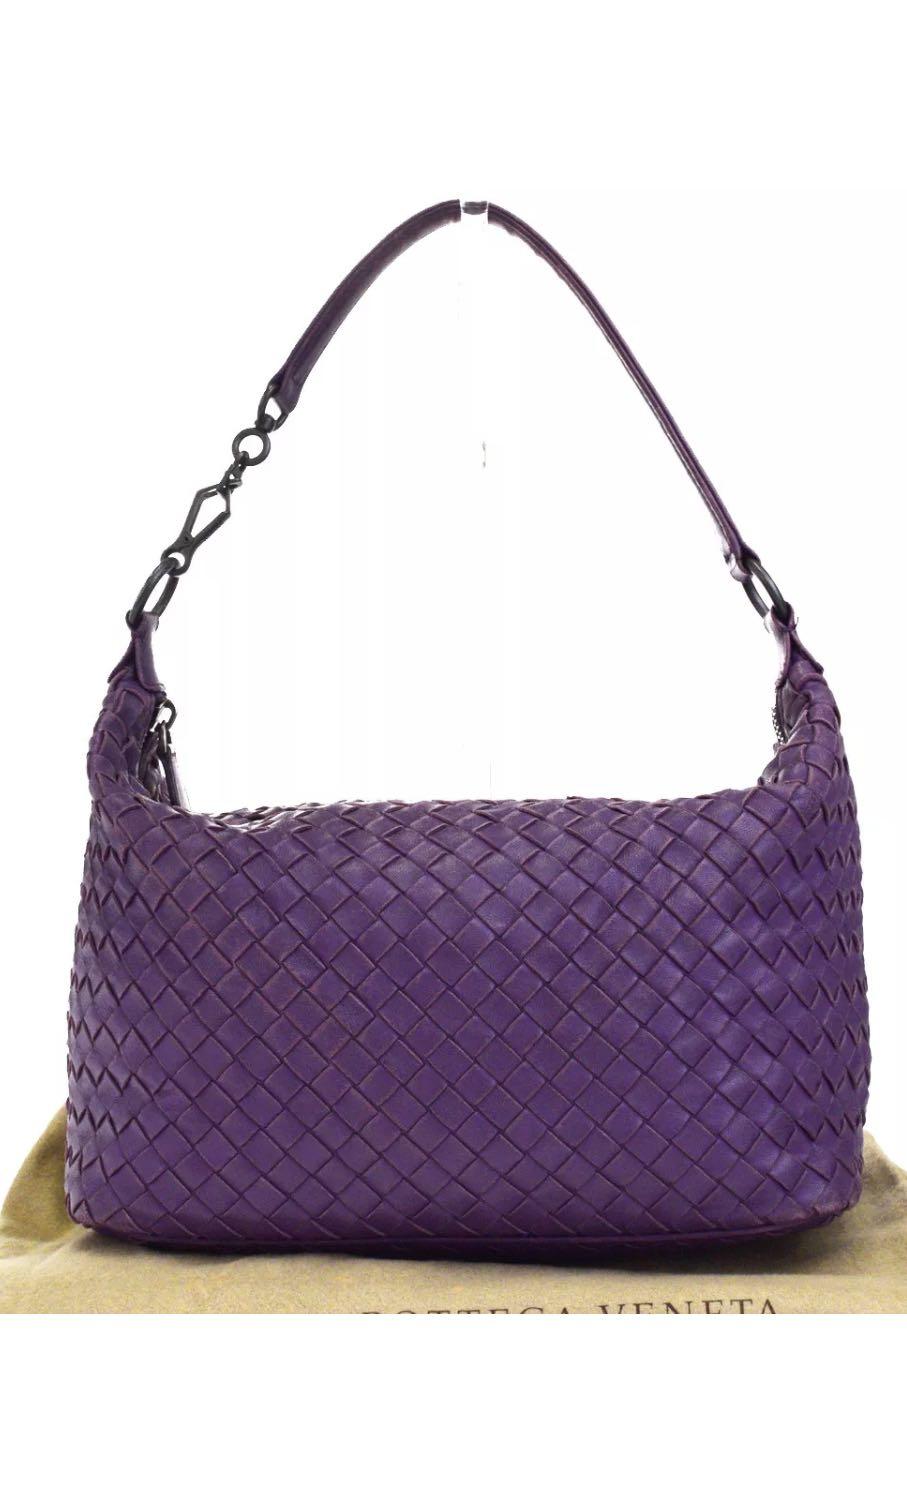 dd2b18f17a9f Authentic Bottega Veneta bag